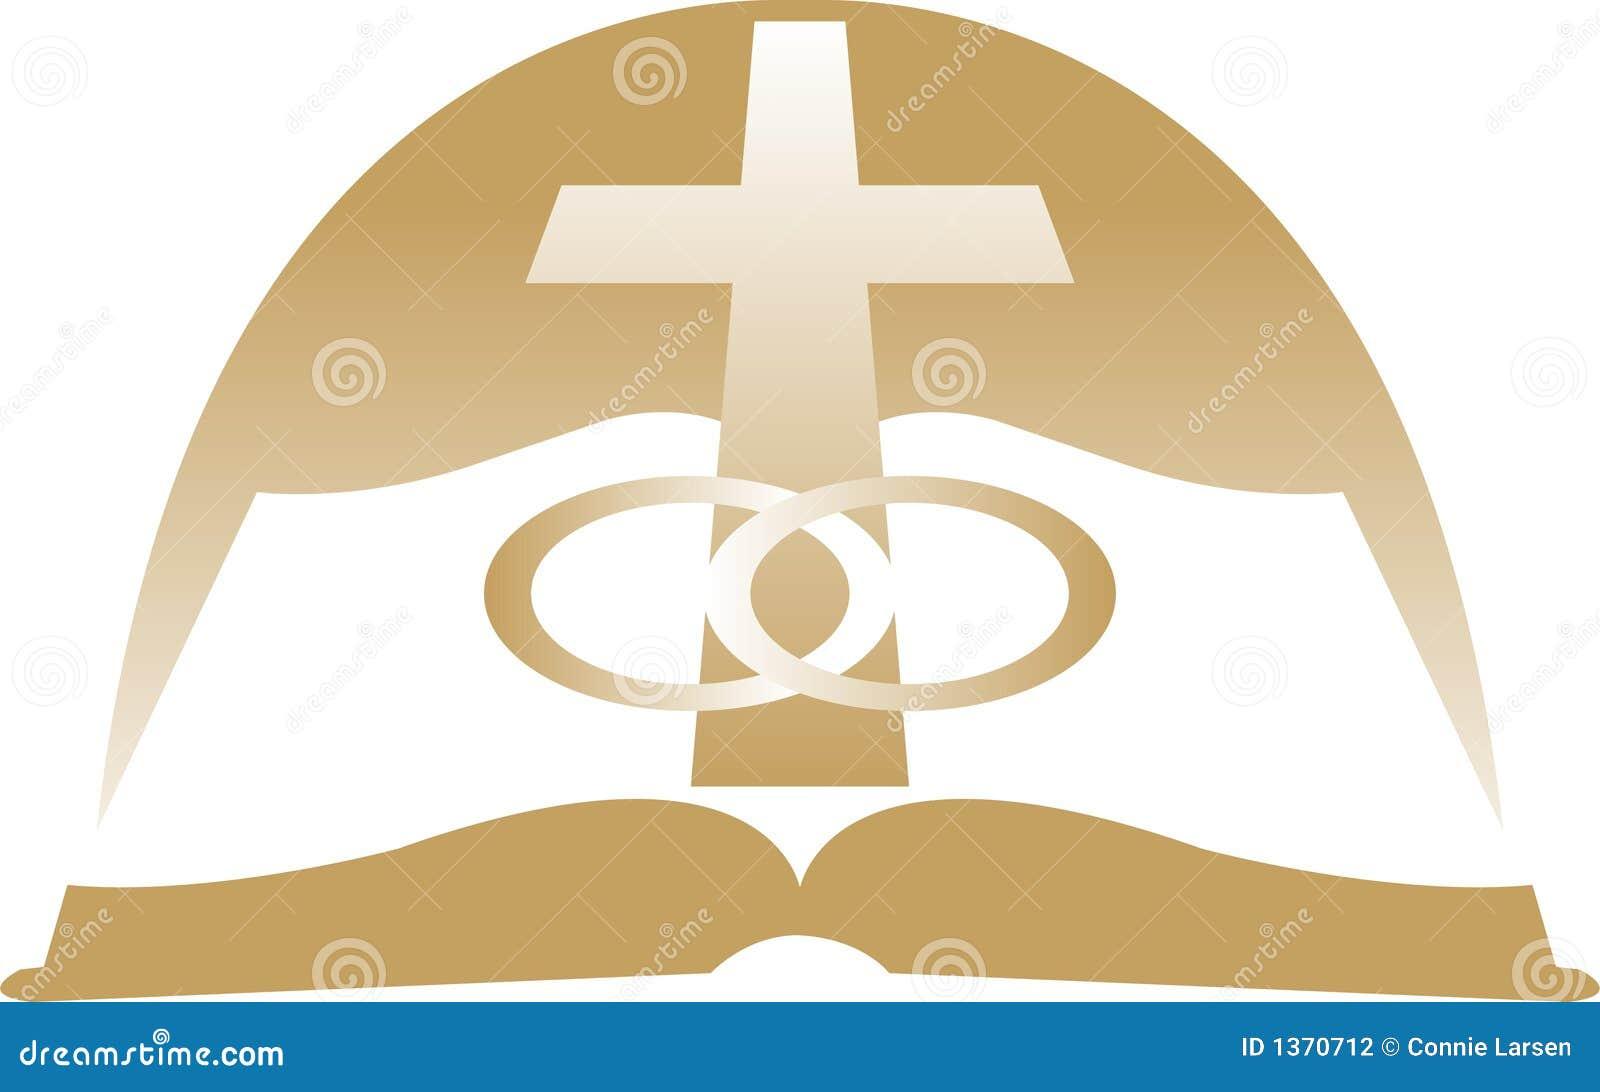 Eps圣洁婚姻